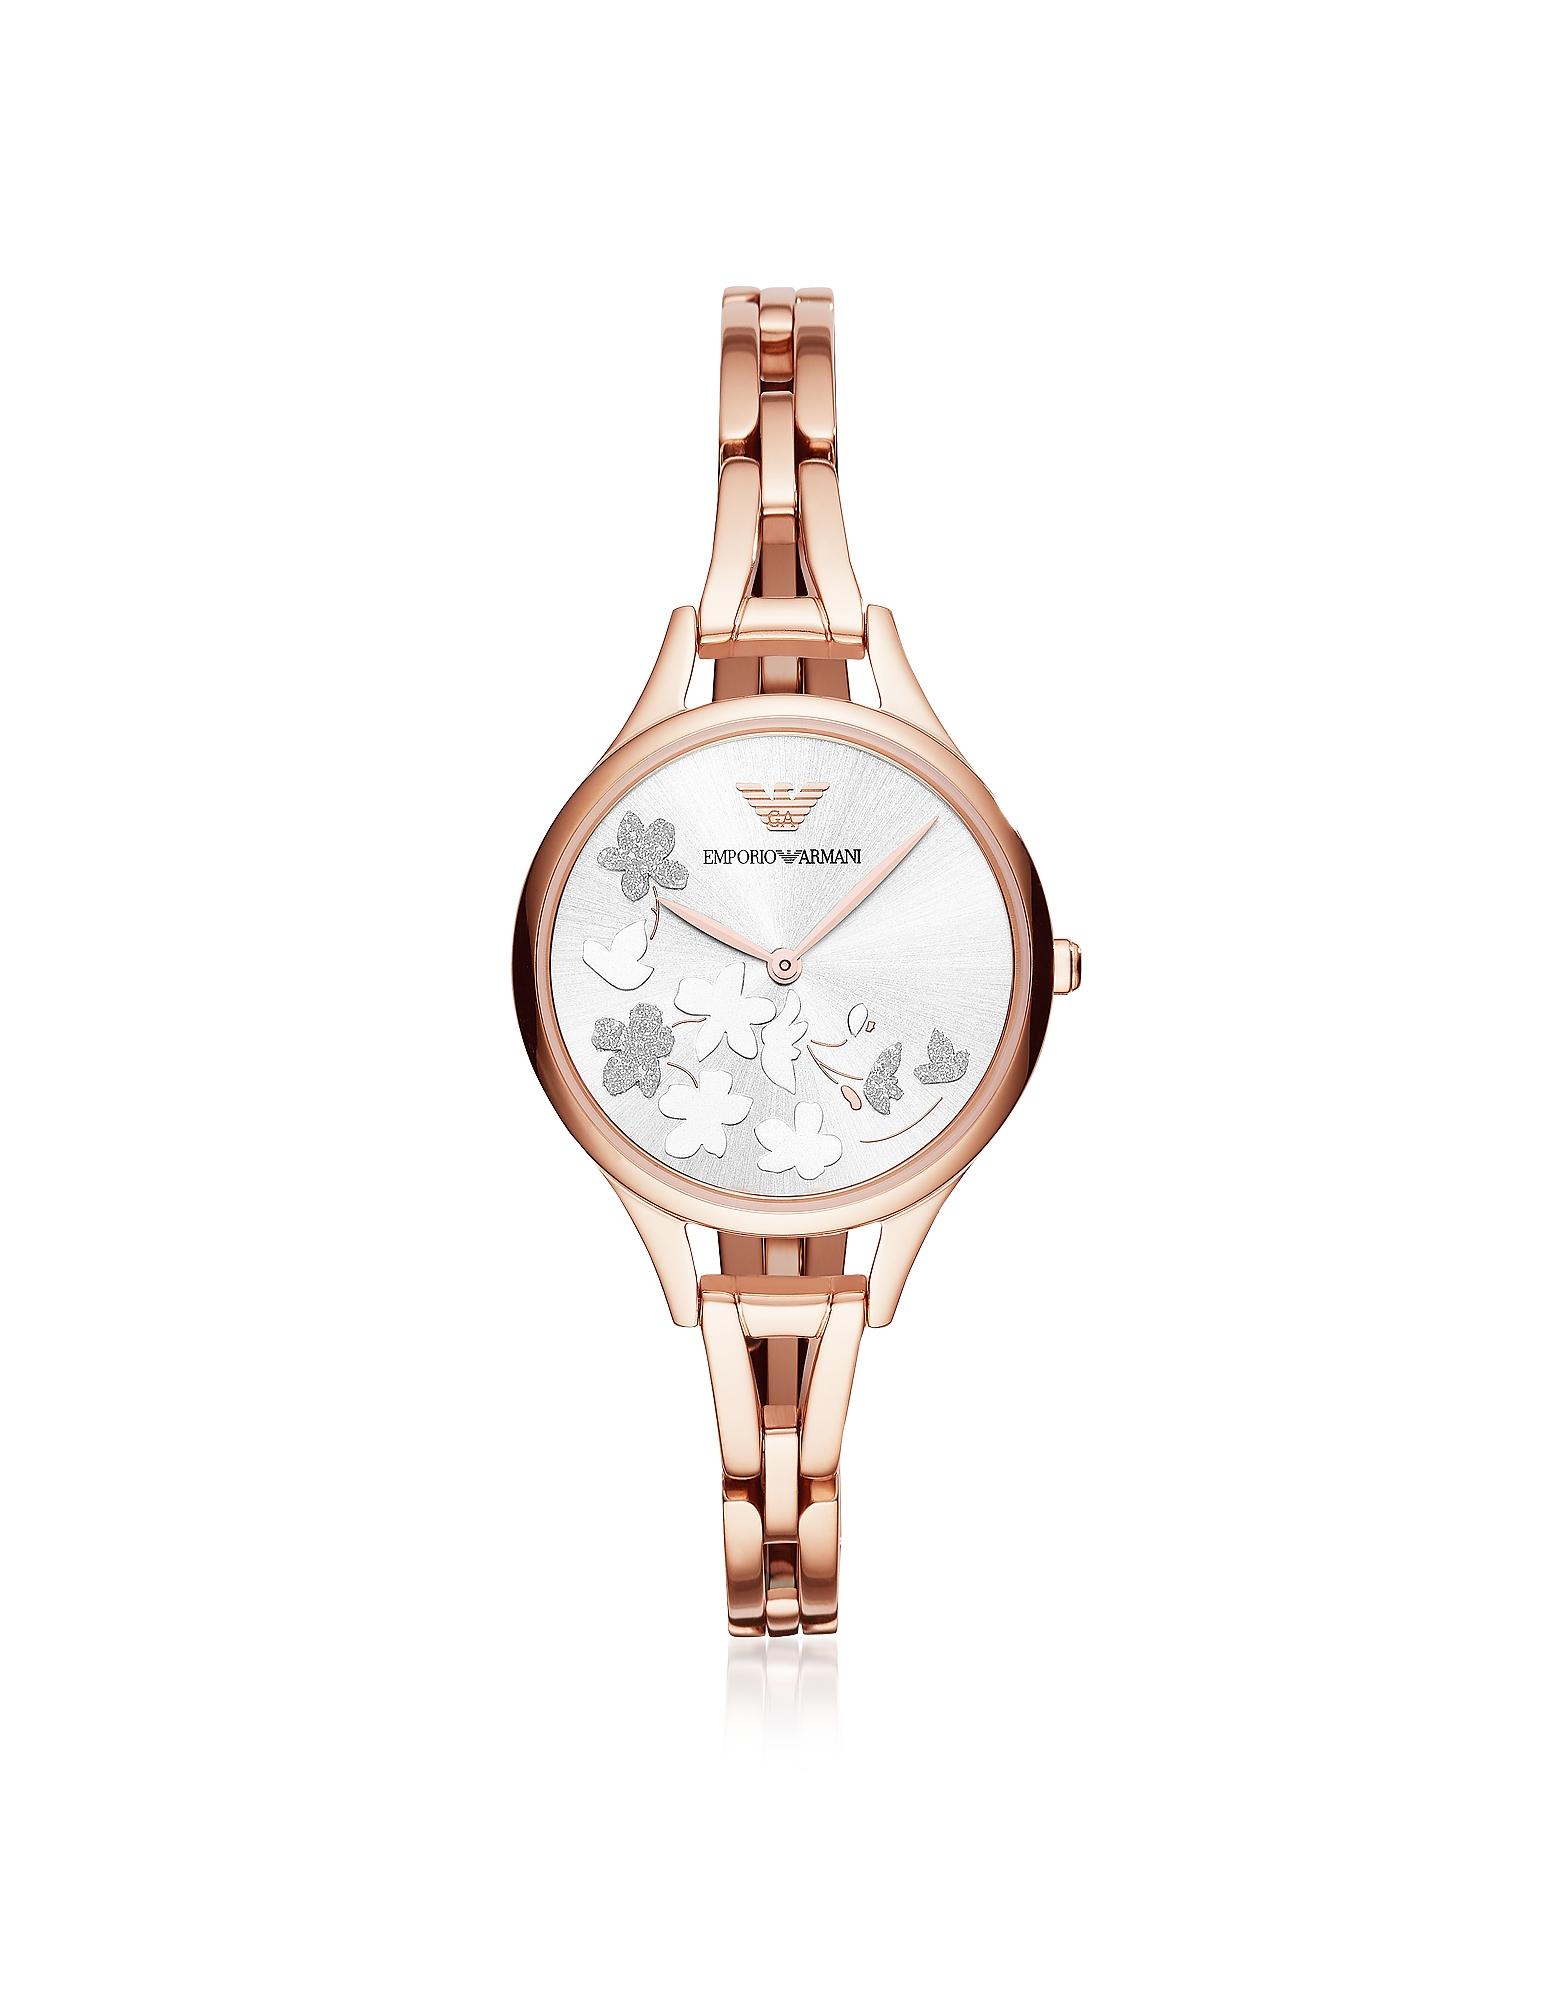 Элегантные Женские Часы Emporio Armani